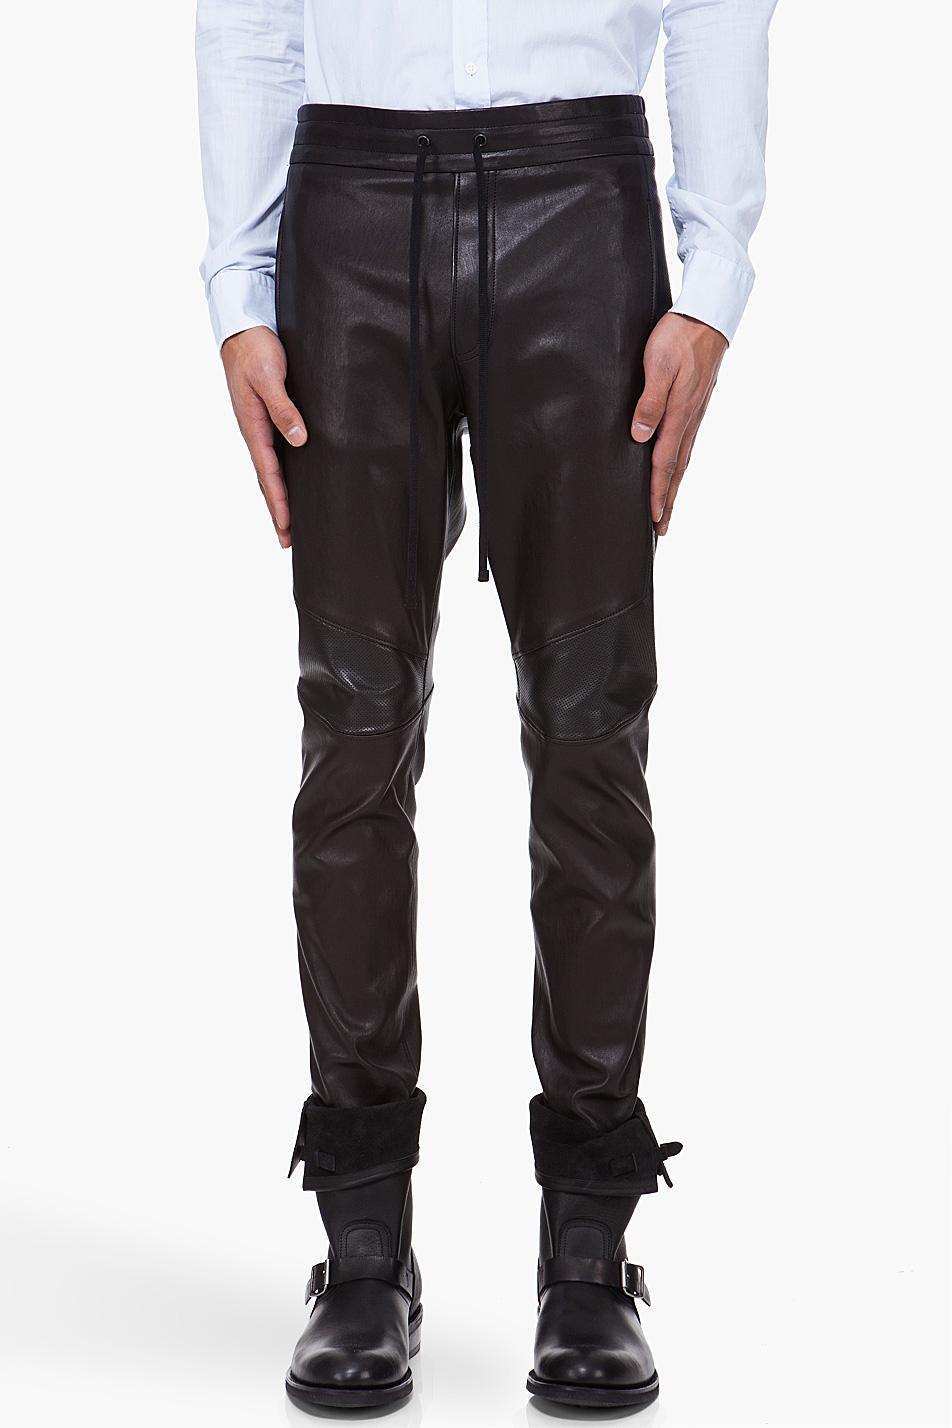 Balmain Black Leather Pants in Black for Men | Lyst